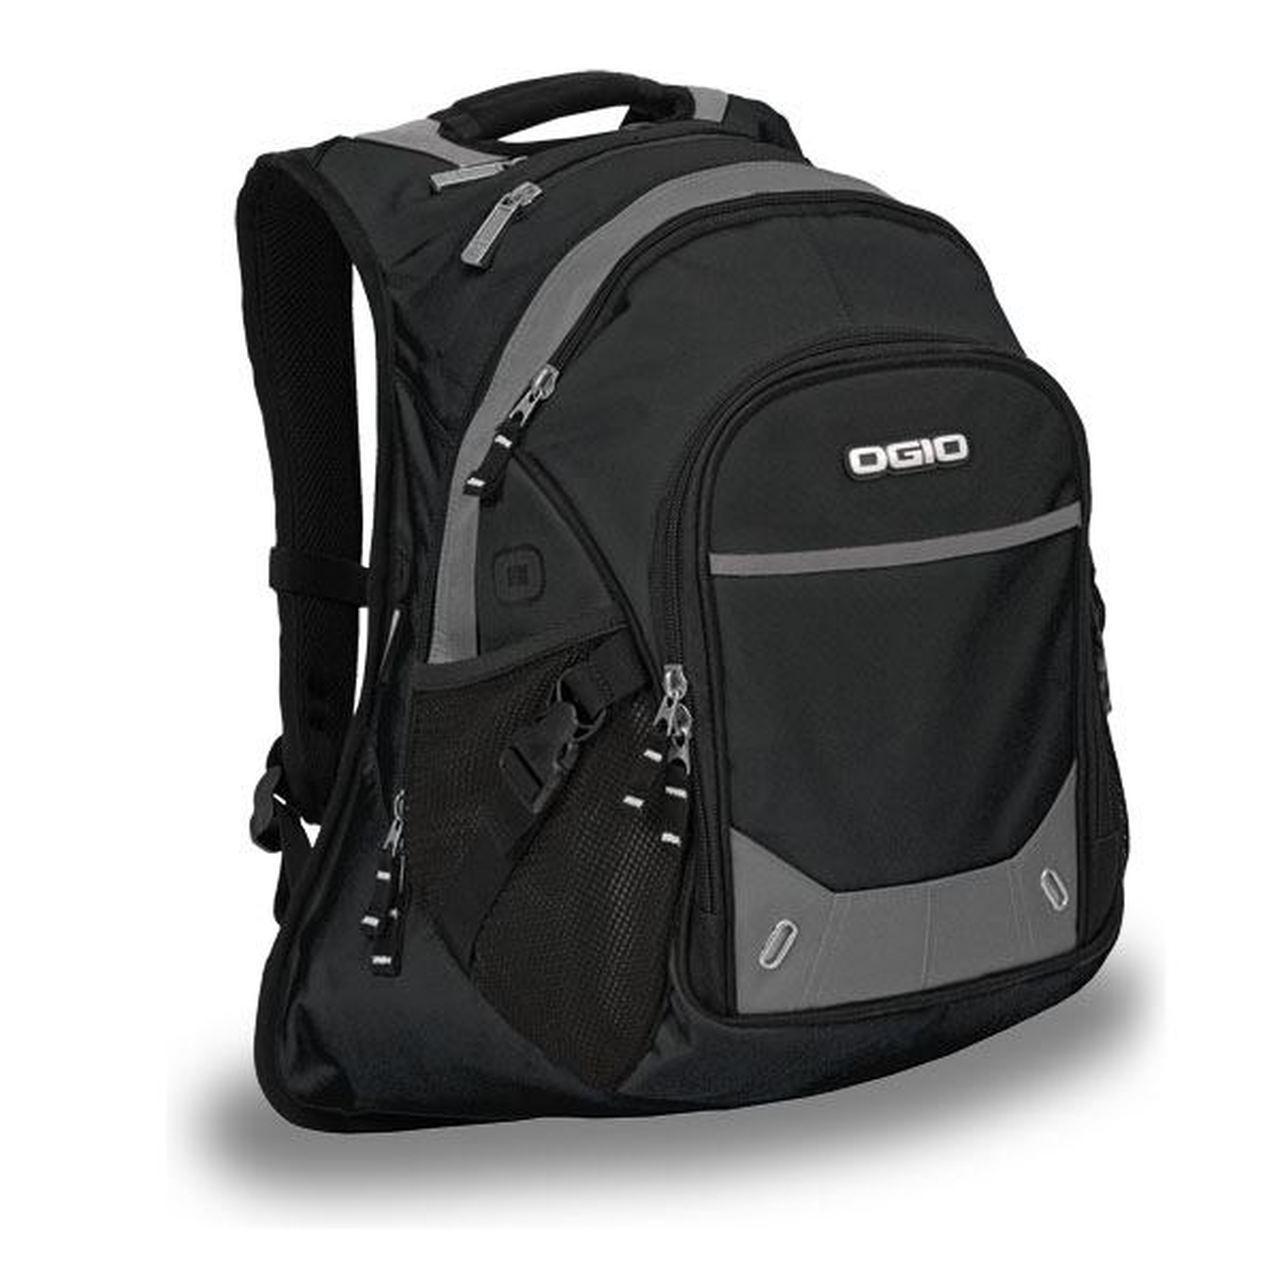 Ogio Bags